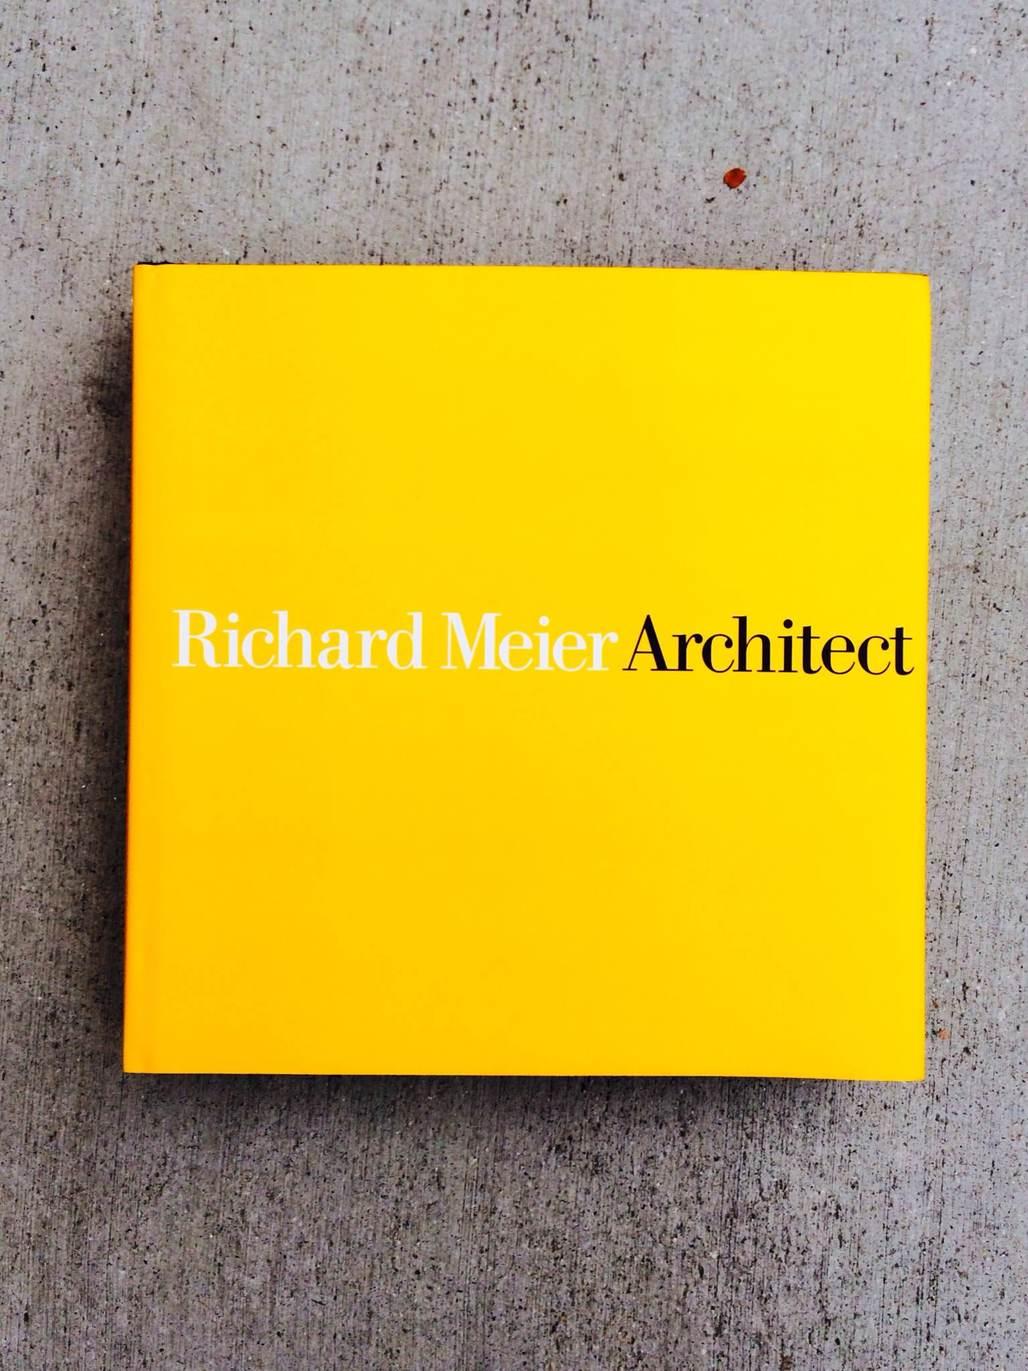 © Richard Meier Architect: Volume 6 by Richard Meier, Rizzoli New York, 2014. Photo by author.